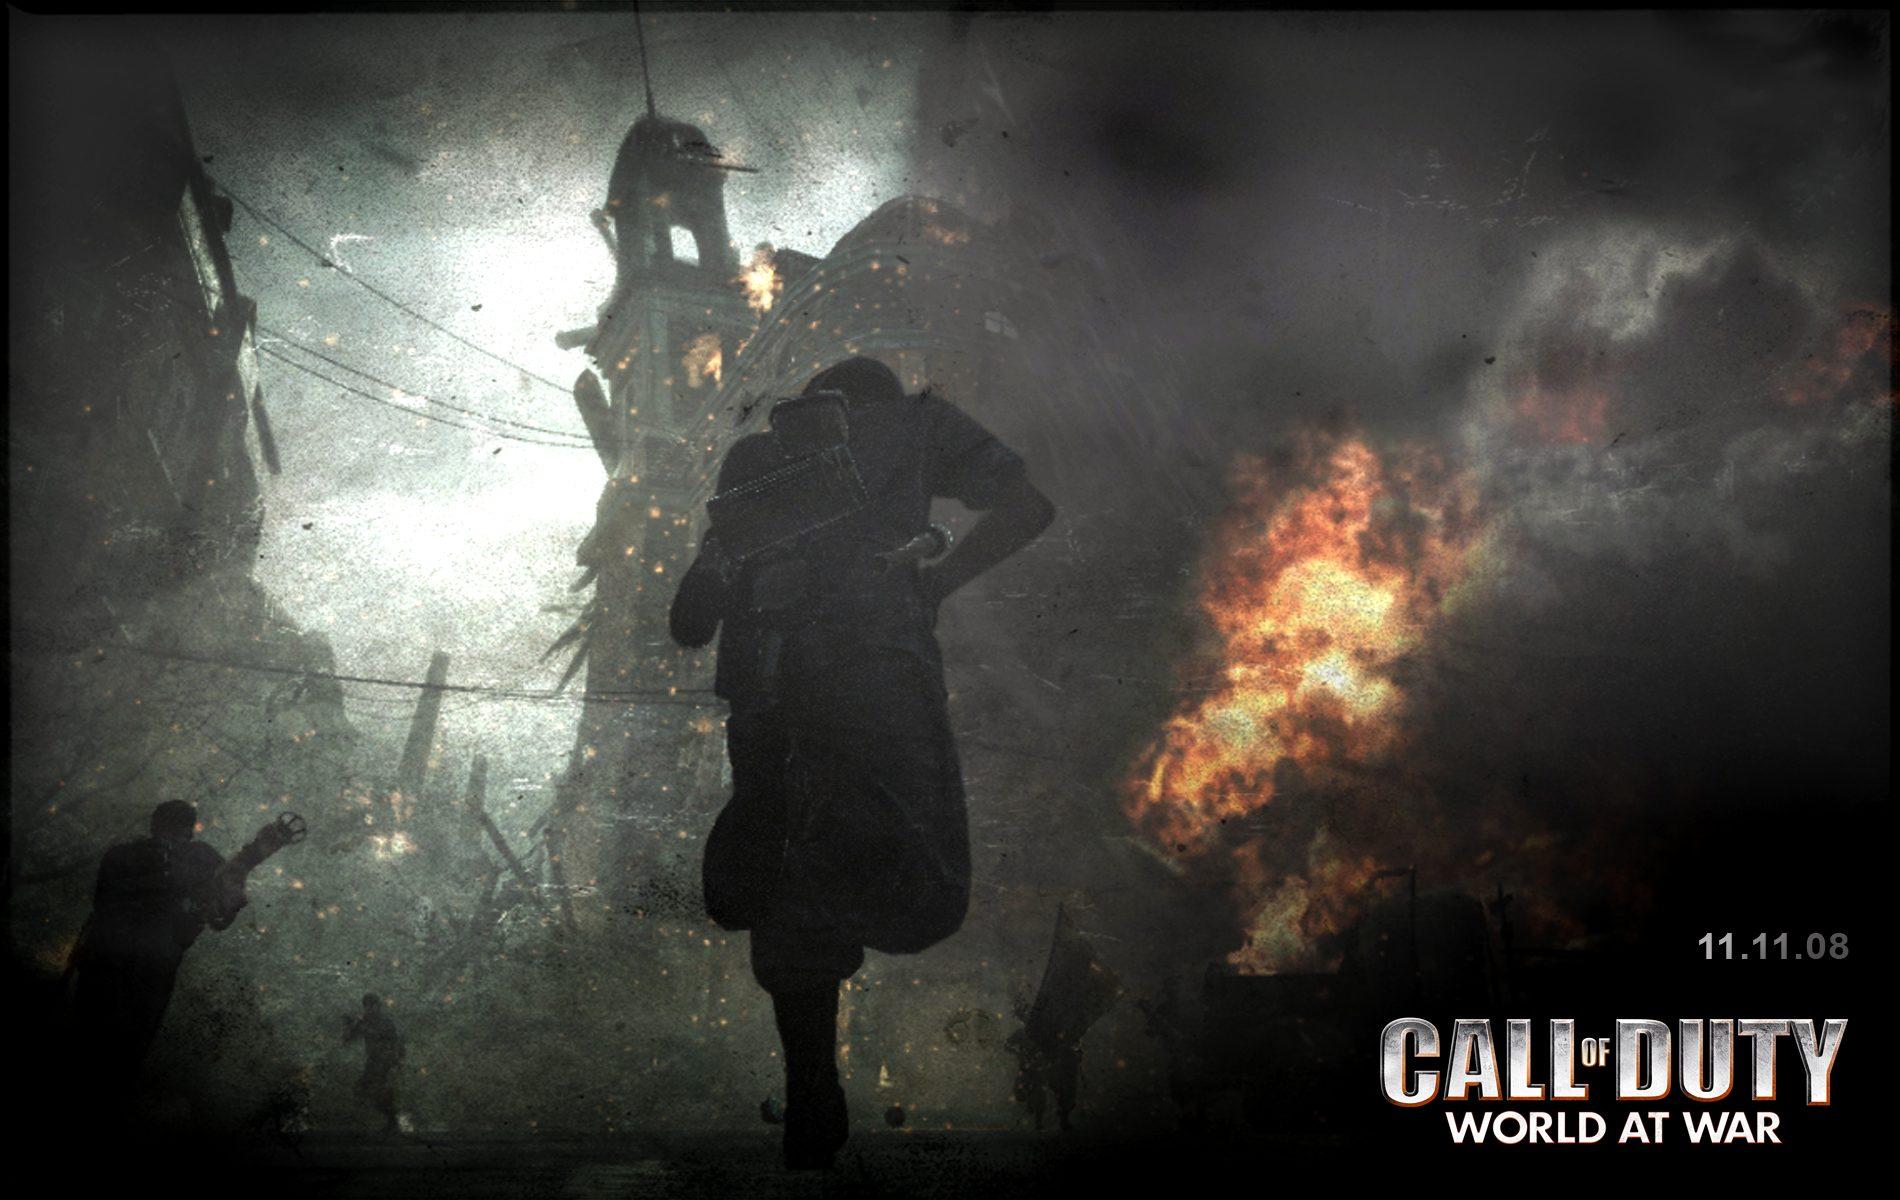 Call of Duty Black Ops Game HD Desktop Wallpaper for K